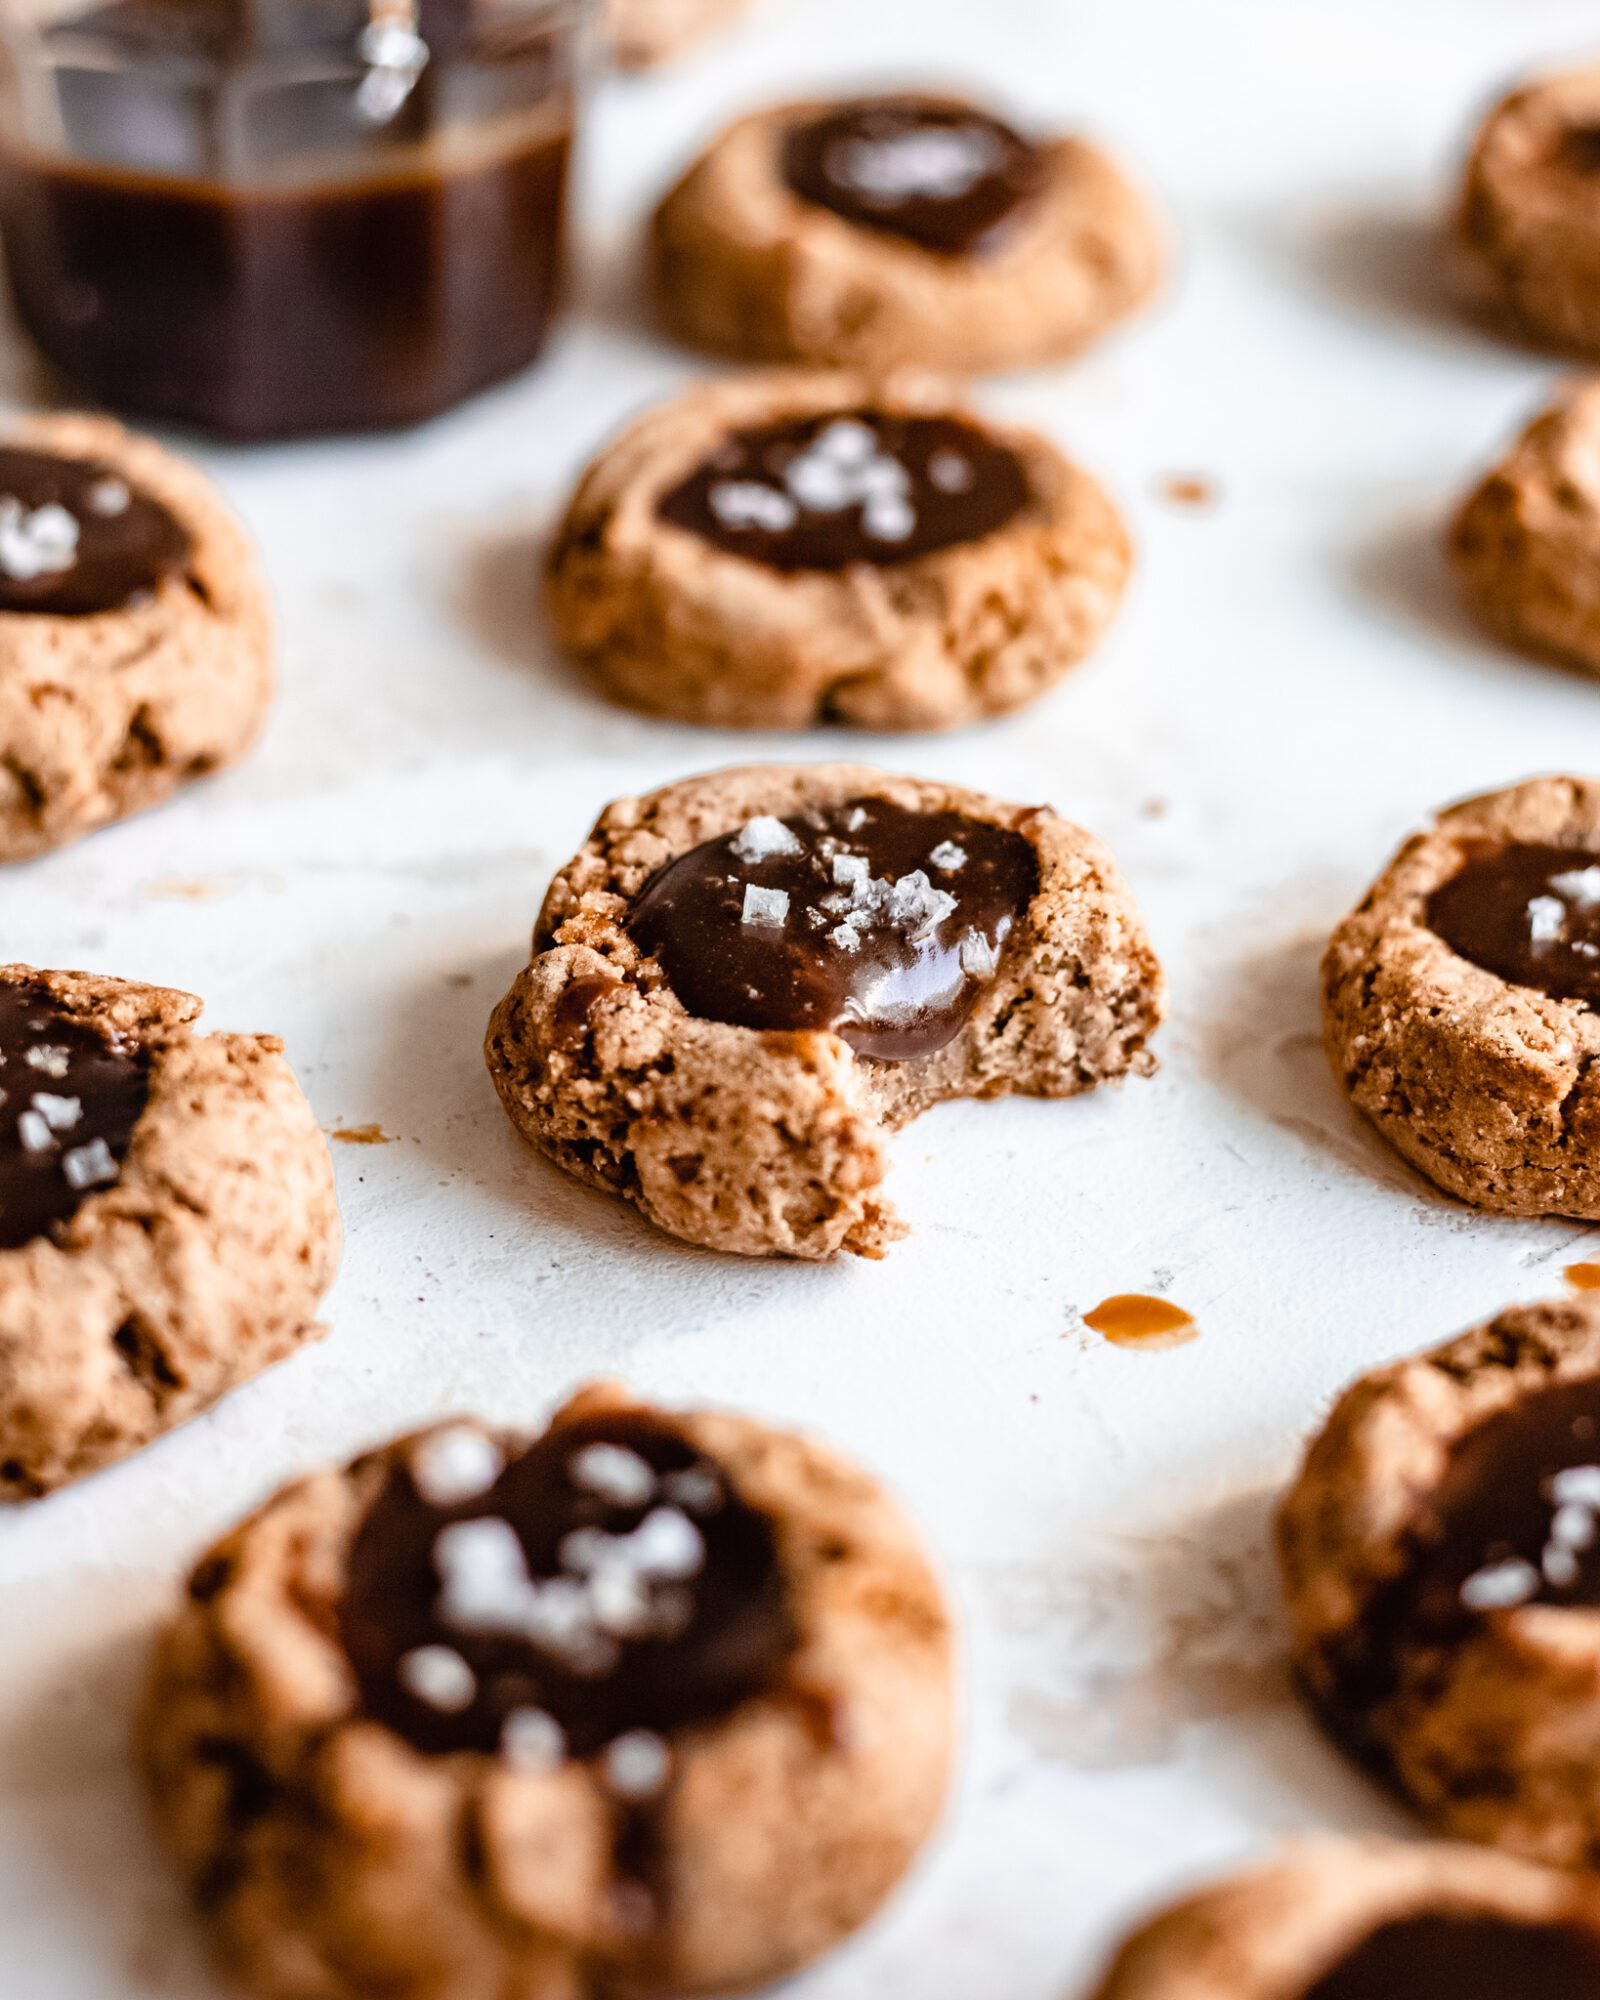 caramel thumbprint cookies on board